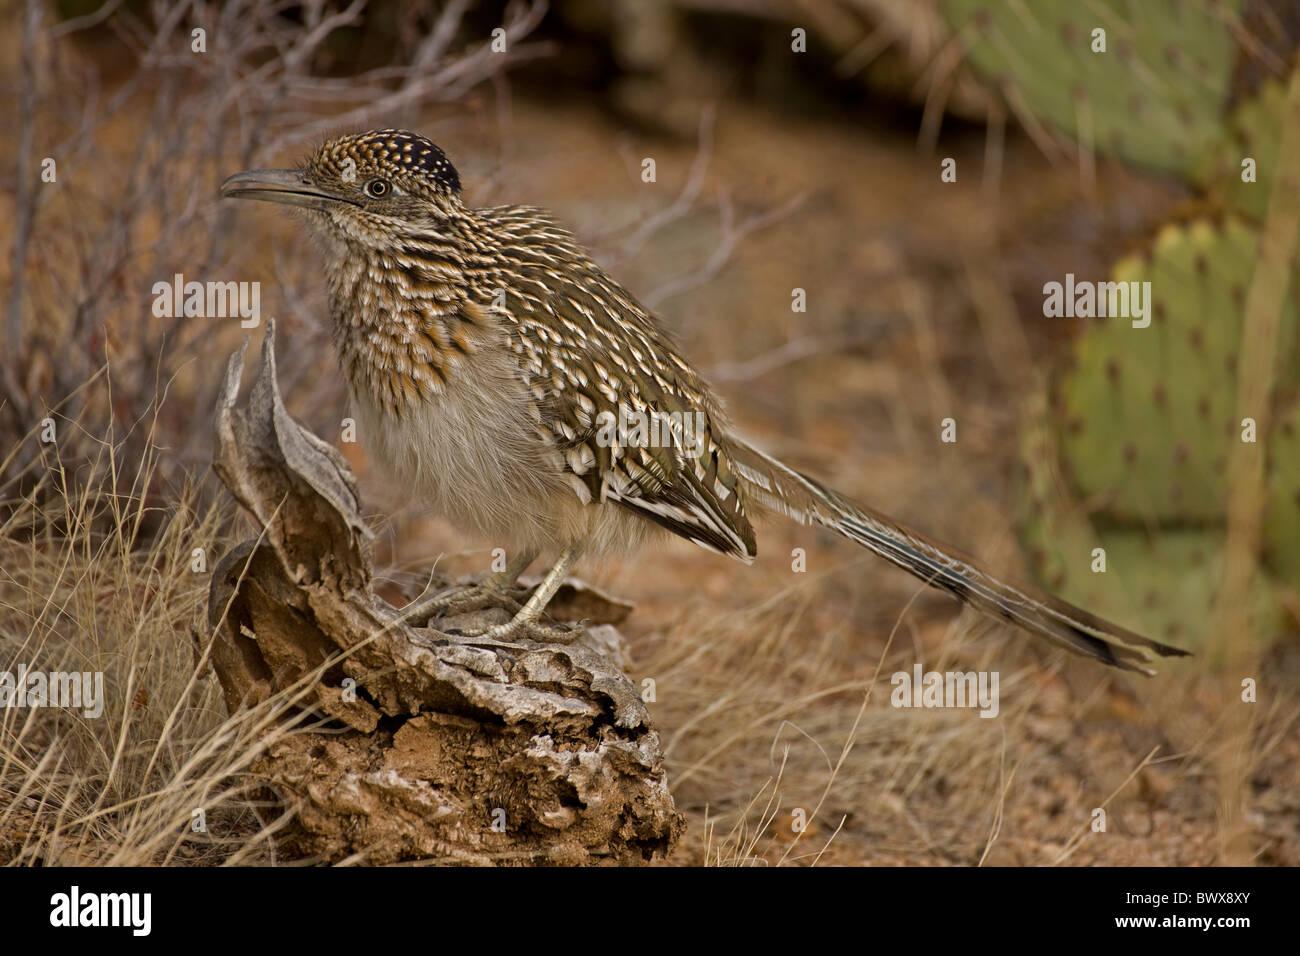 Greater Roadrunner (Geococcyx californianus) Arizona - Stock Image